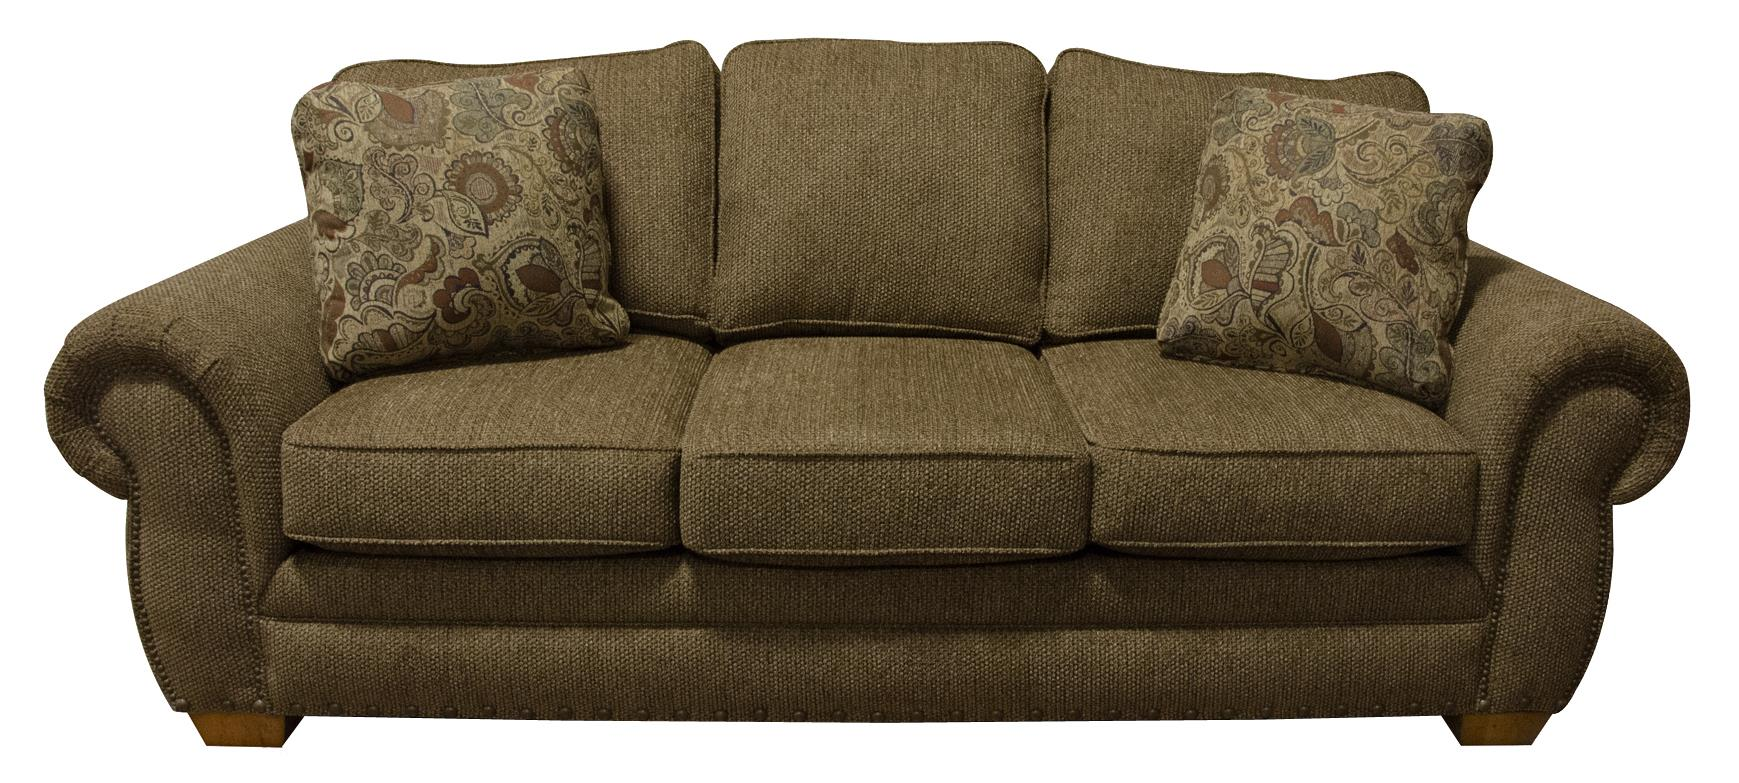 England Walters Sofa Sleeper with Nailhead Trim - Item Number: 6639N-6432